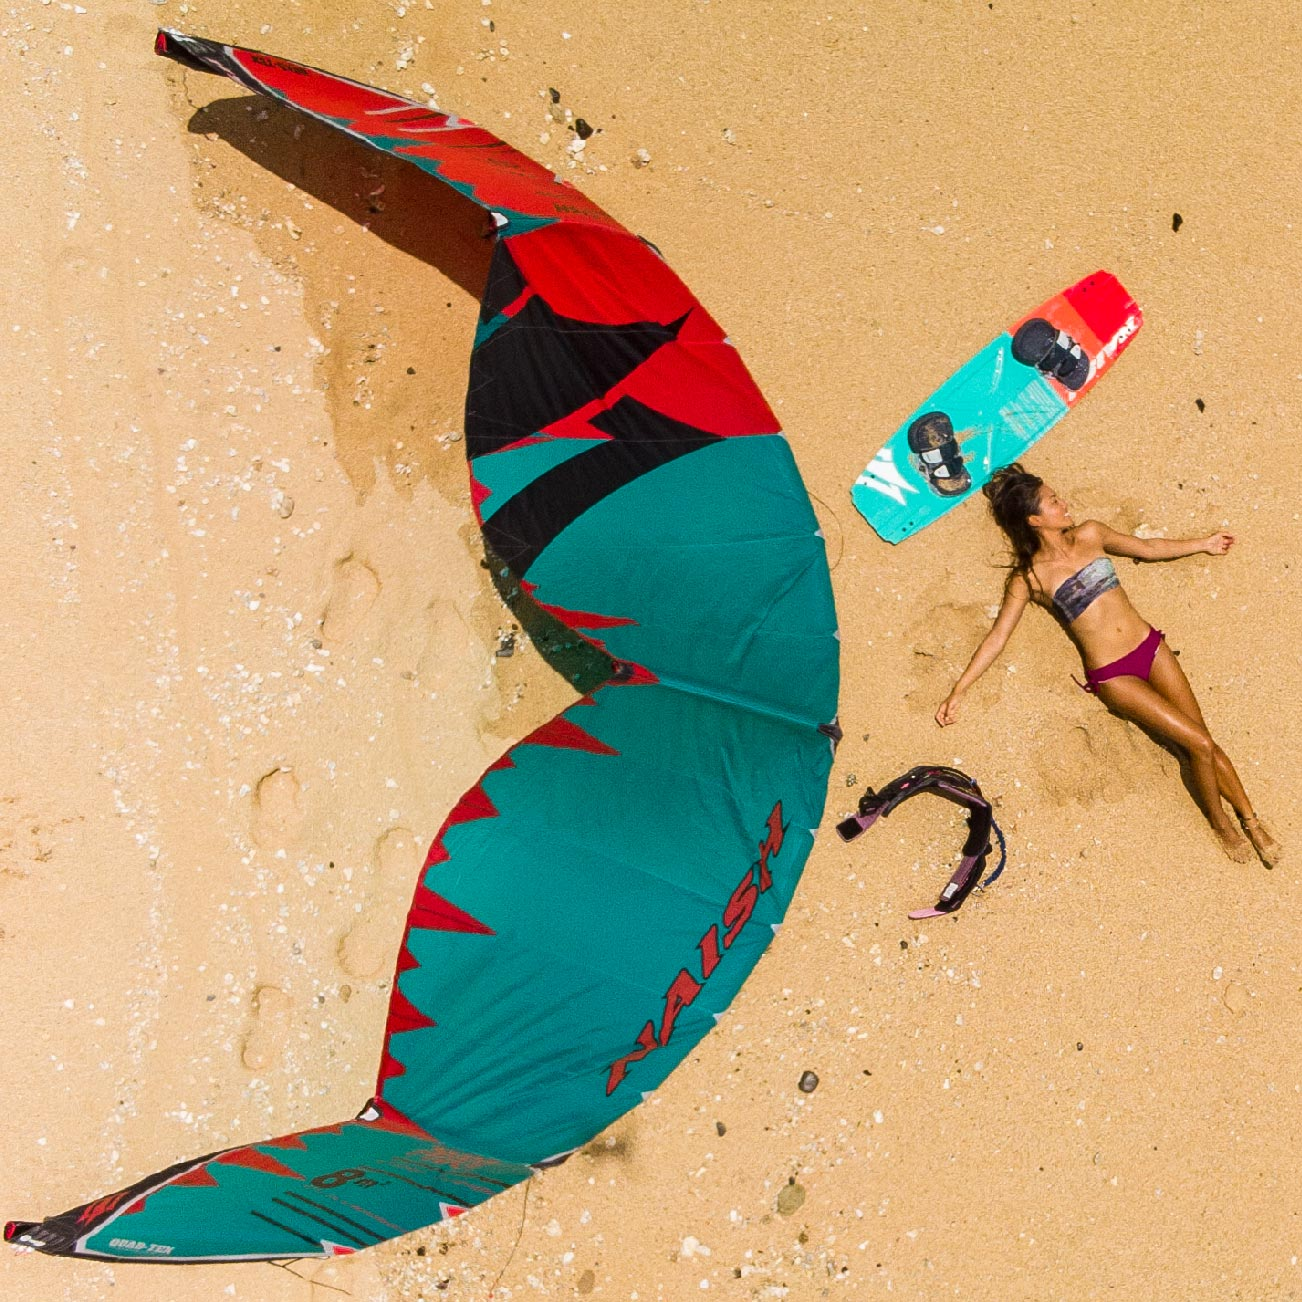 exciting st kilda kitesurfing lessons kite republic